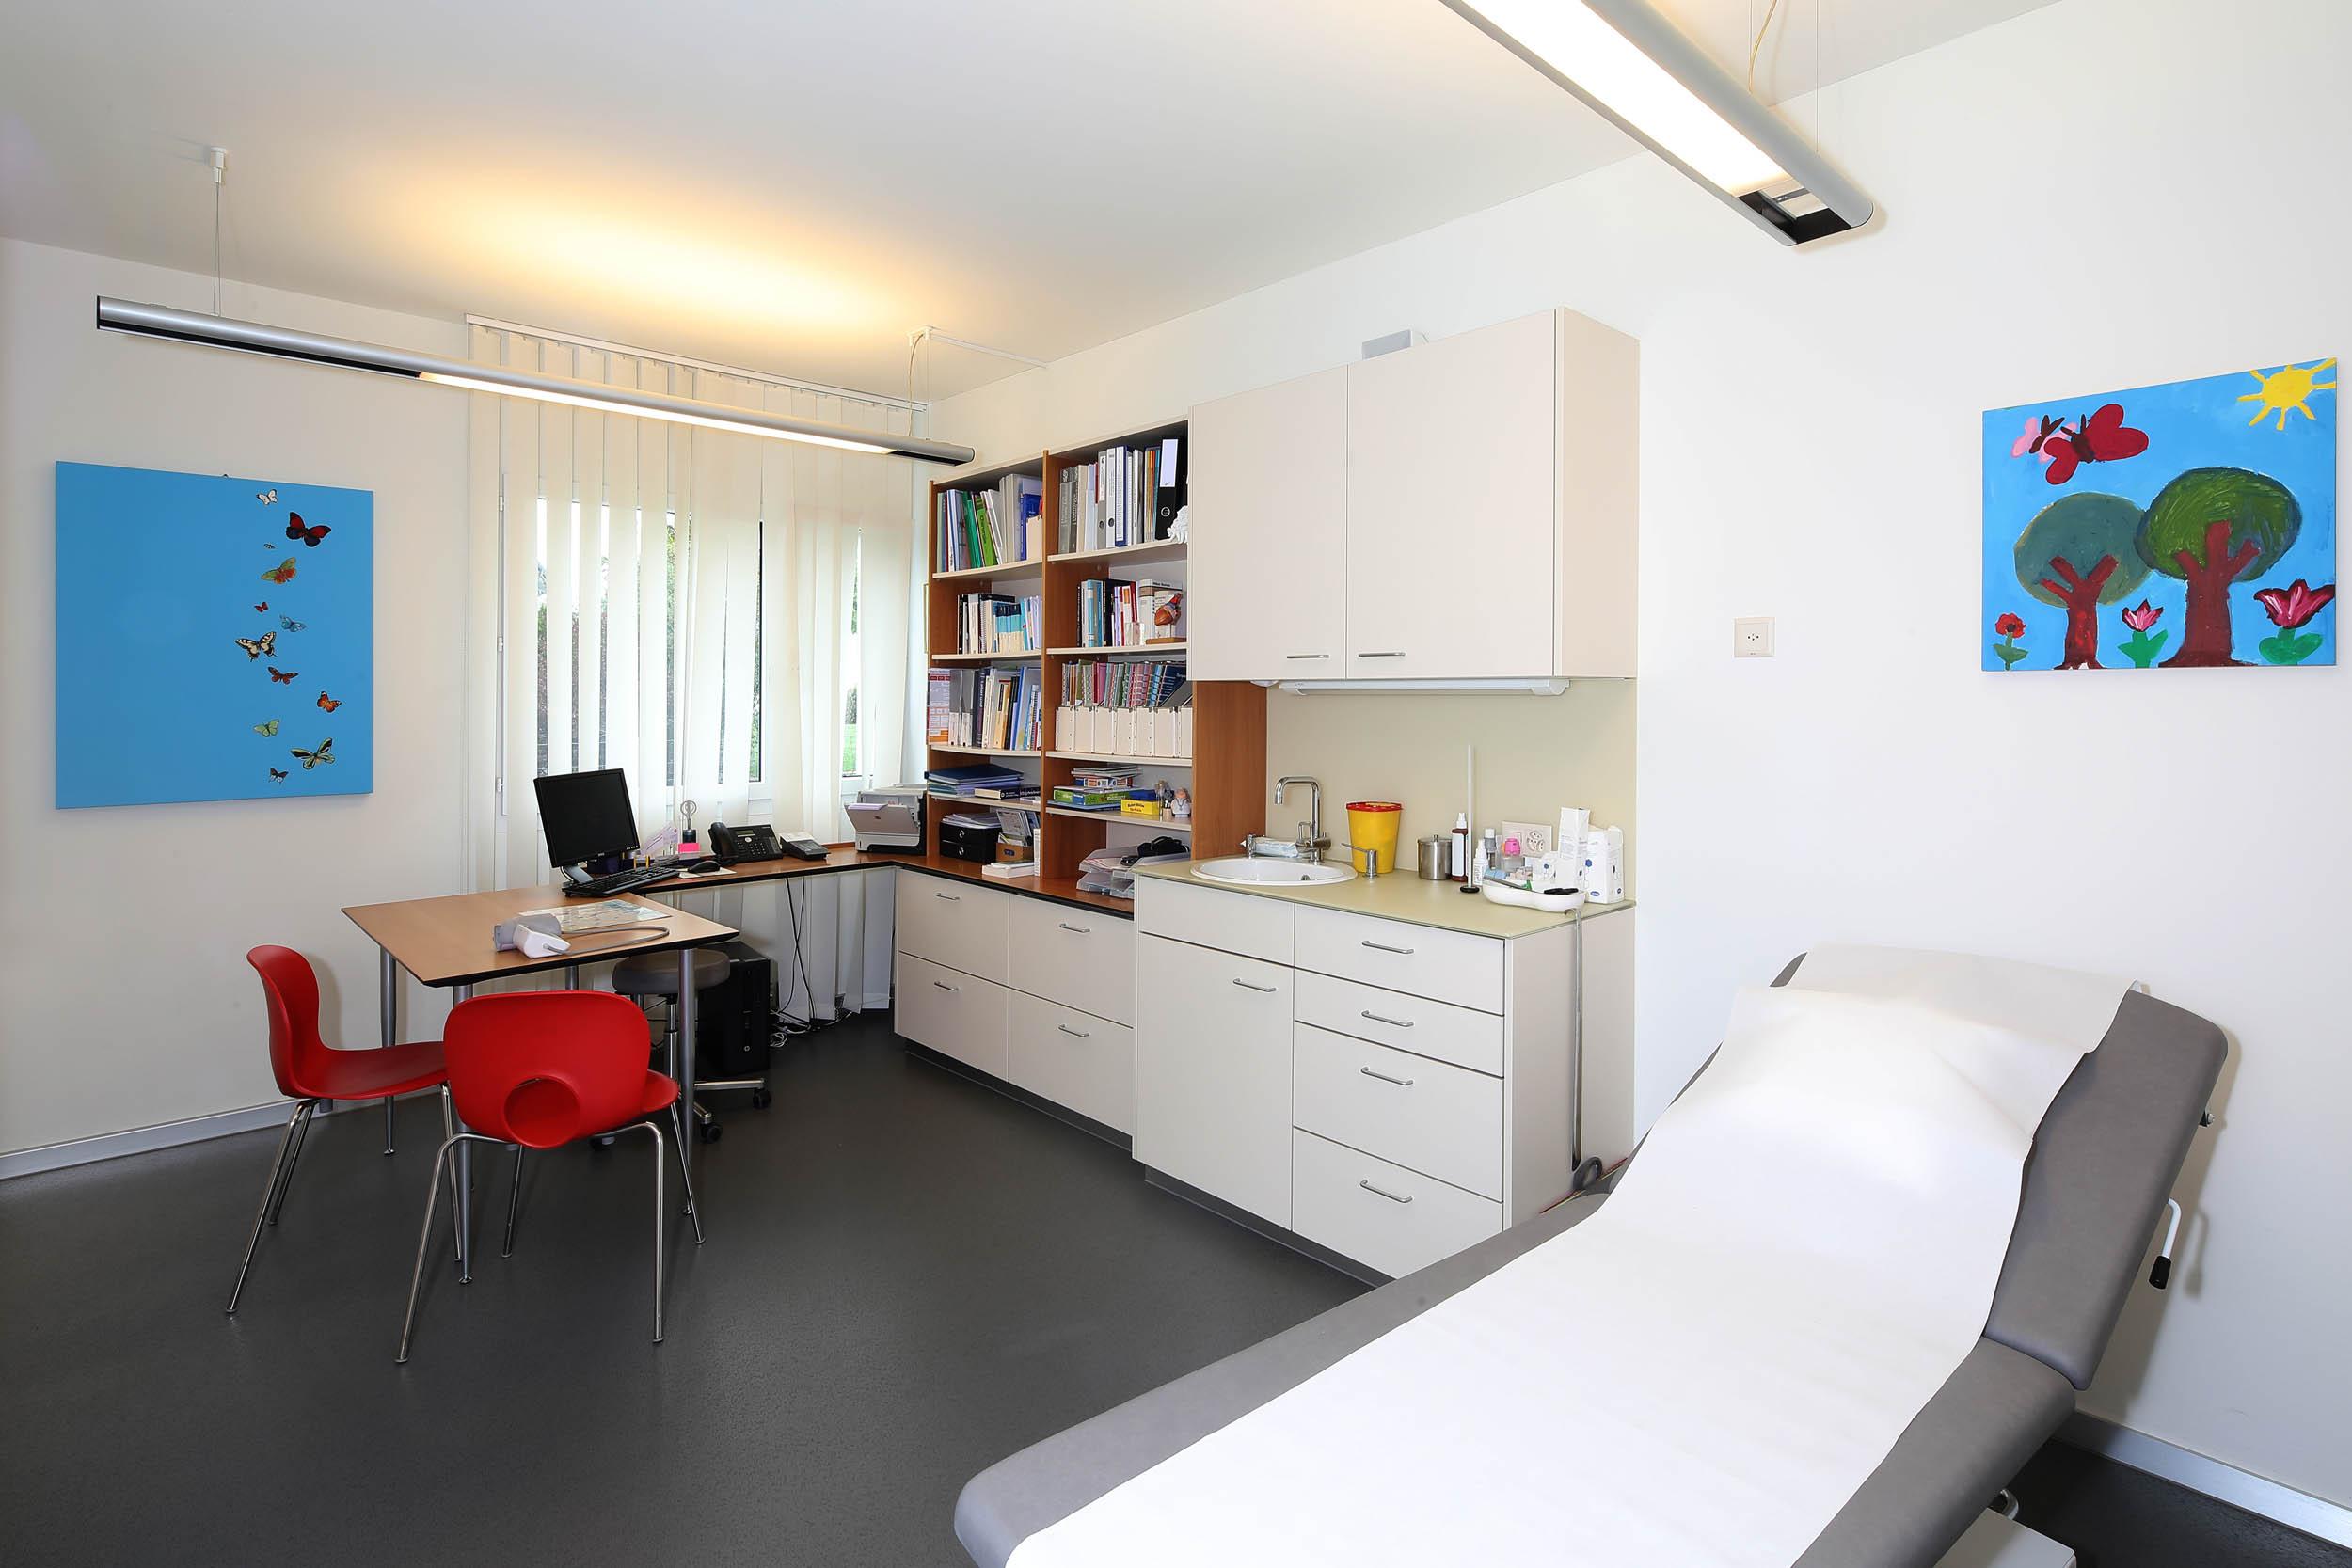 4668_praxisgemeinschaft-kofmehl-huus